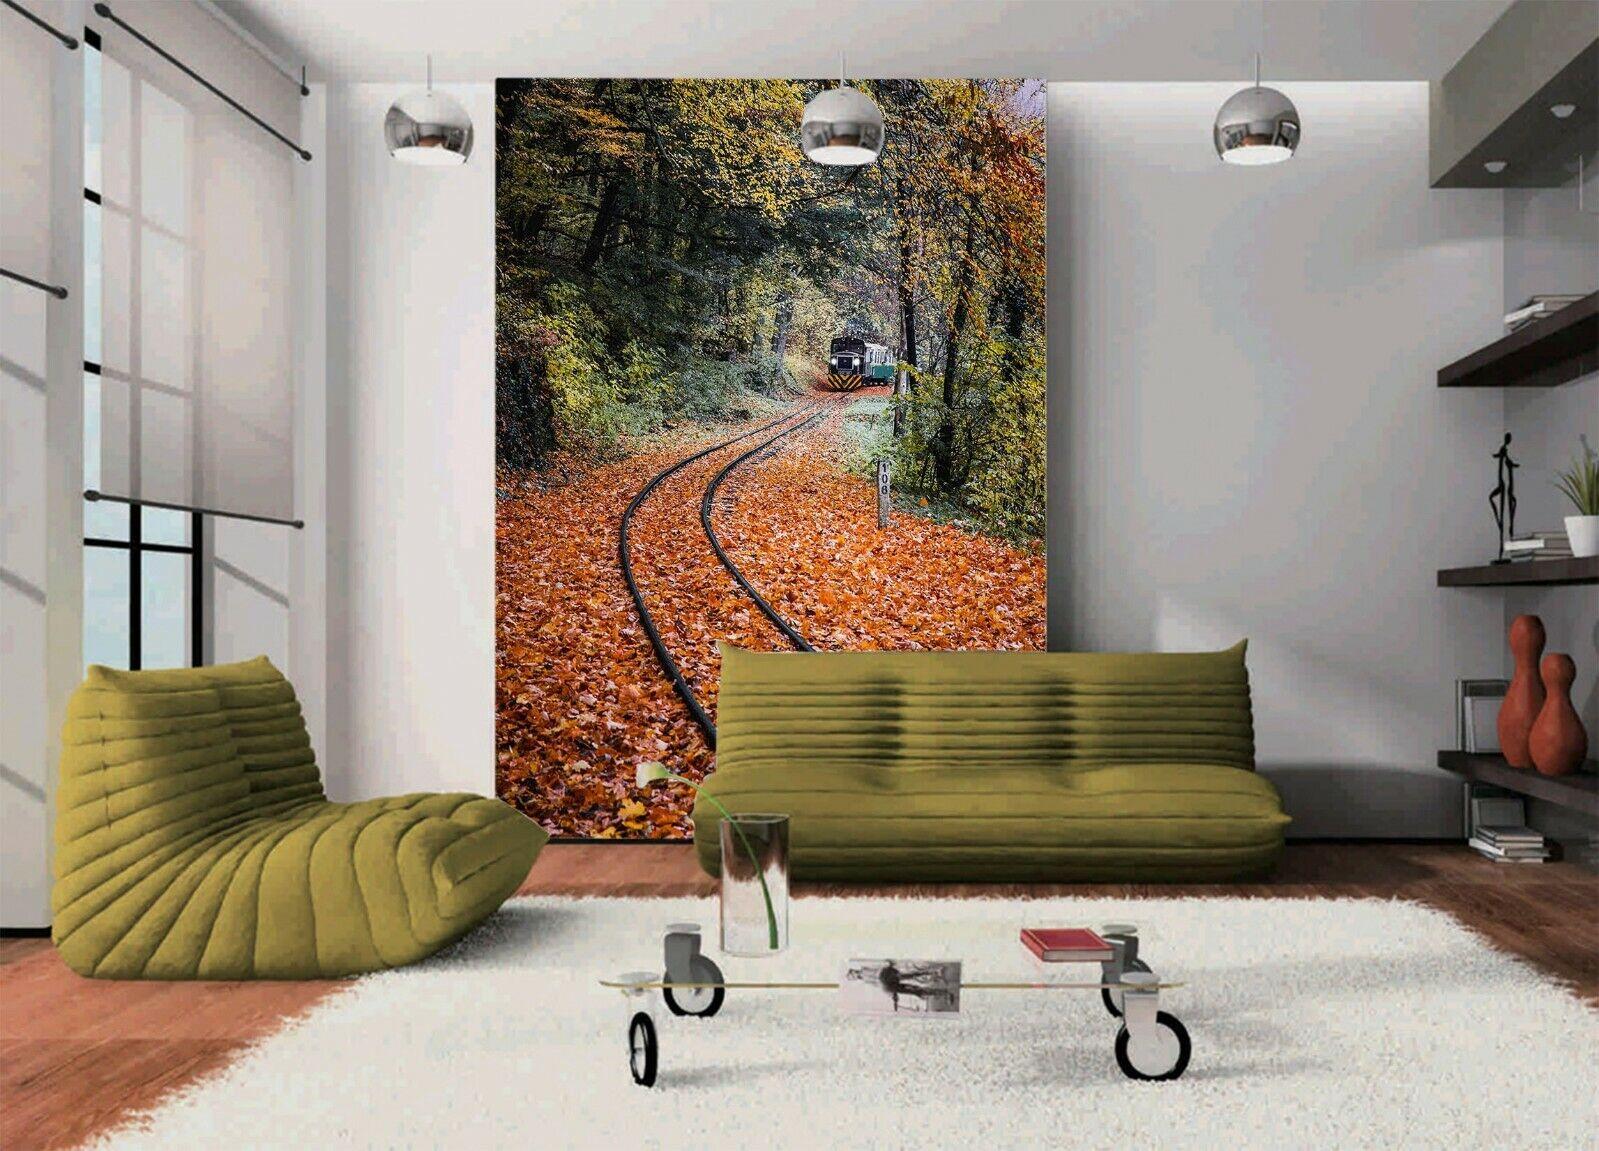 3D Maple Leaf Railway R12 Transport Wallpaper Mural Sefl-adhesive Removable Zoe